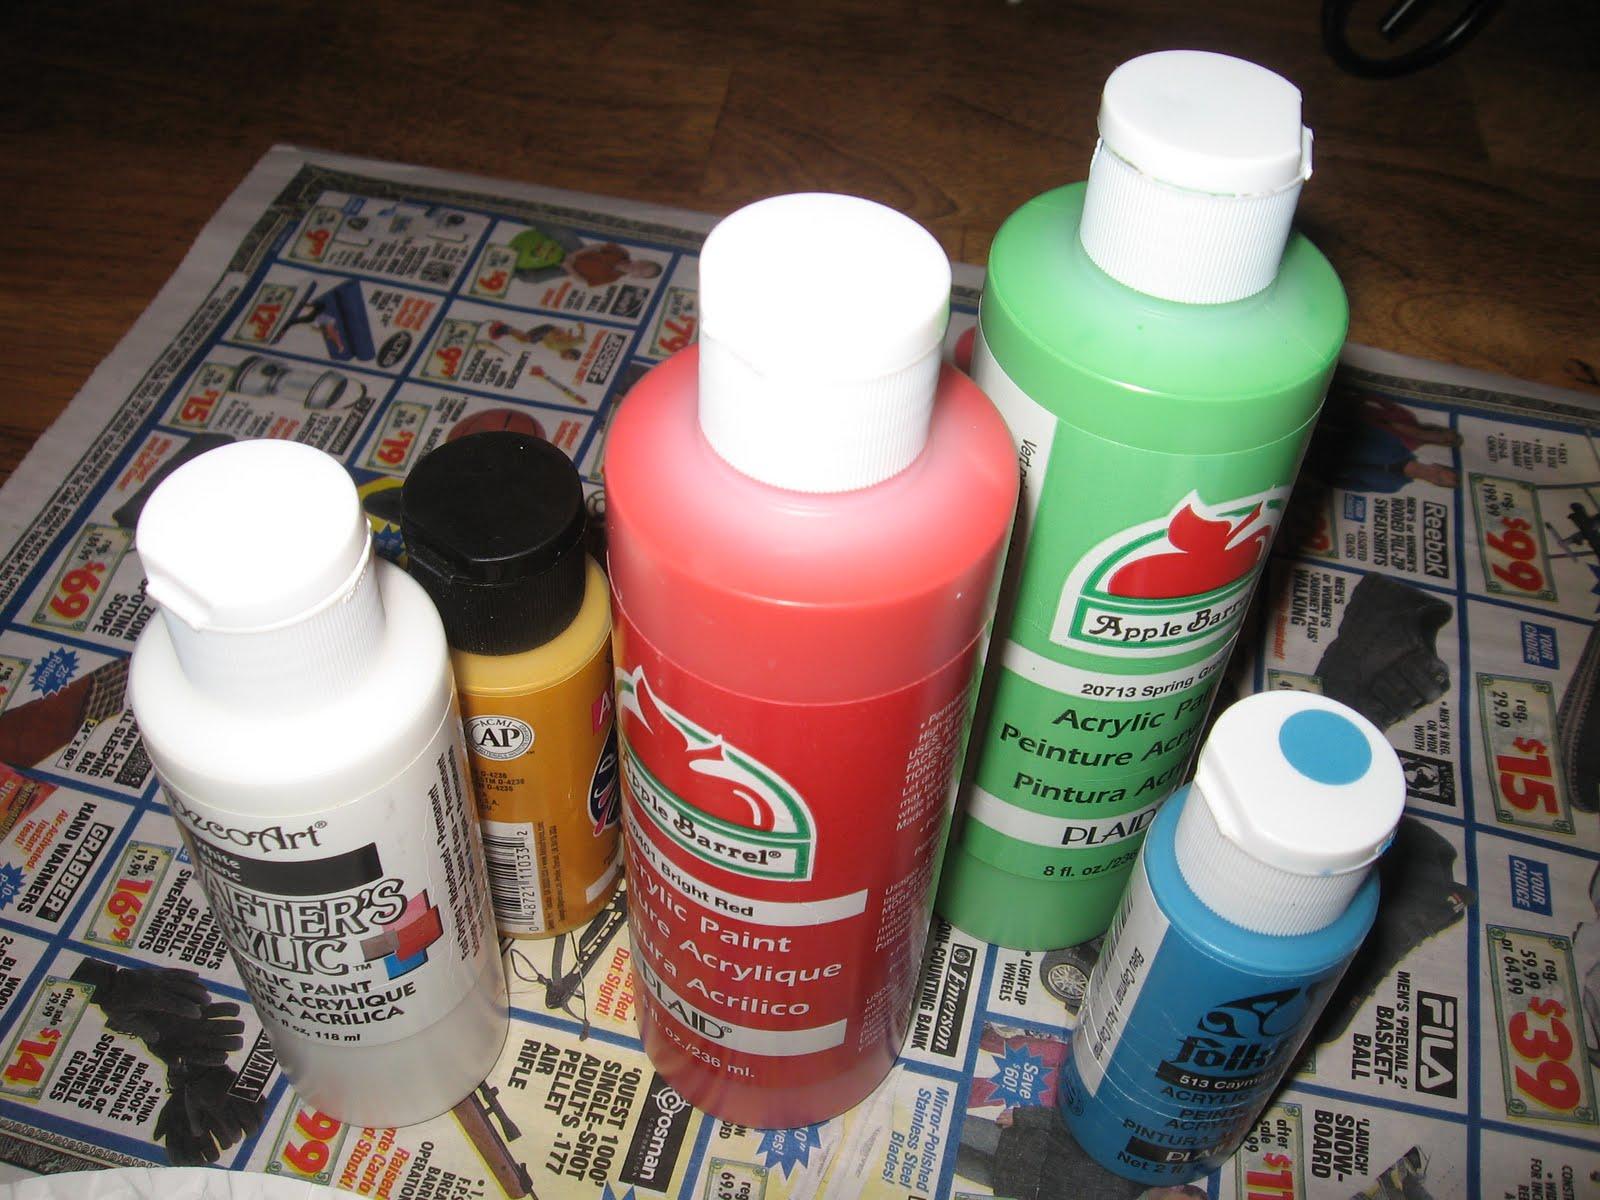 Craft Supplies - Paper Mache, Paper Mache Houses, Paper Match